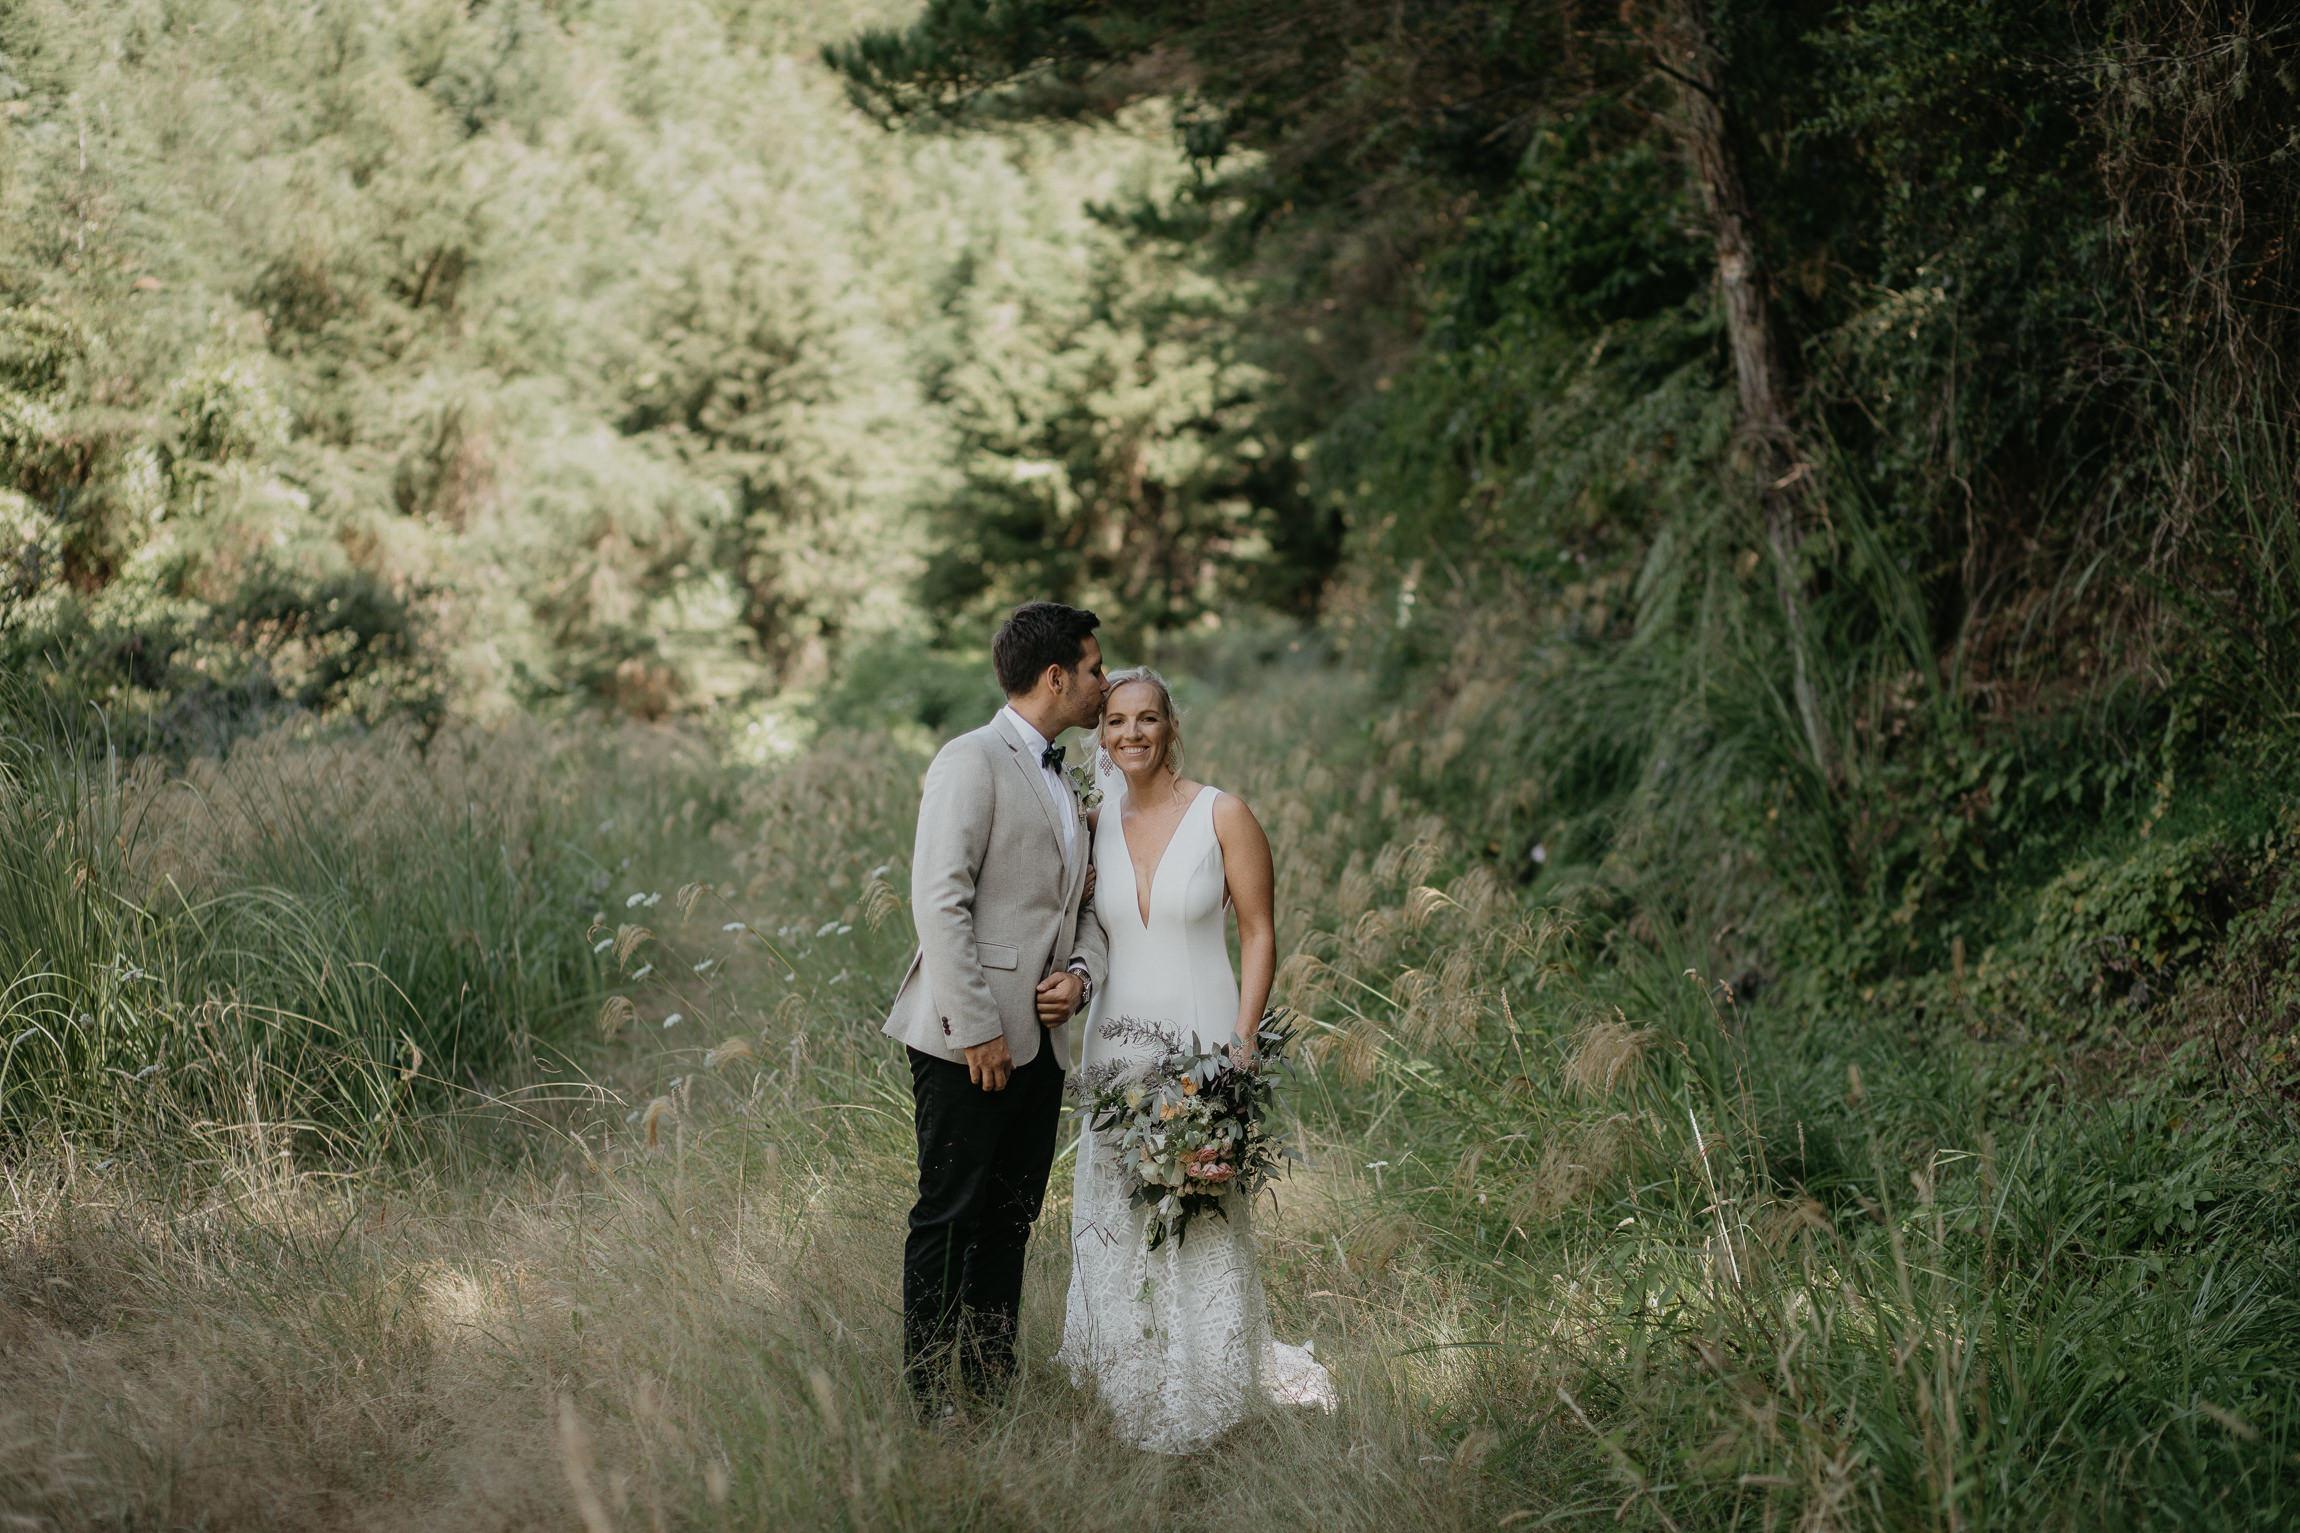 oldforestschool-wedding-blog-77.jpg